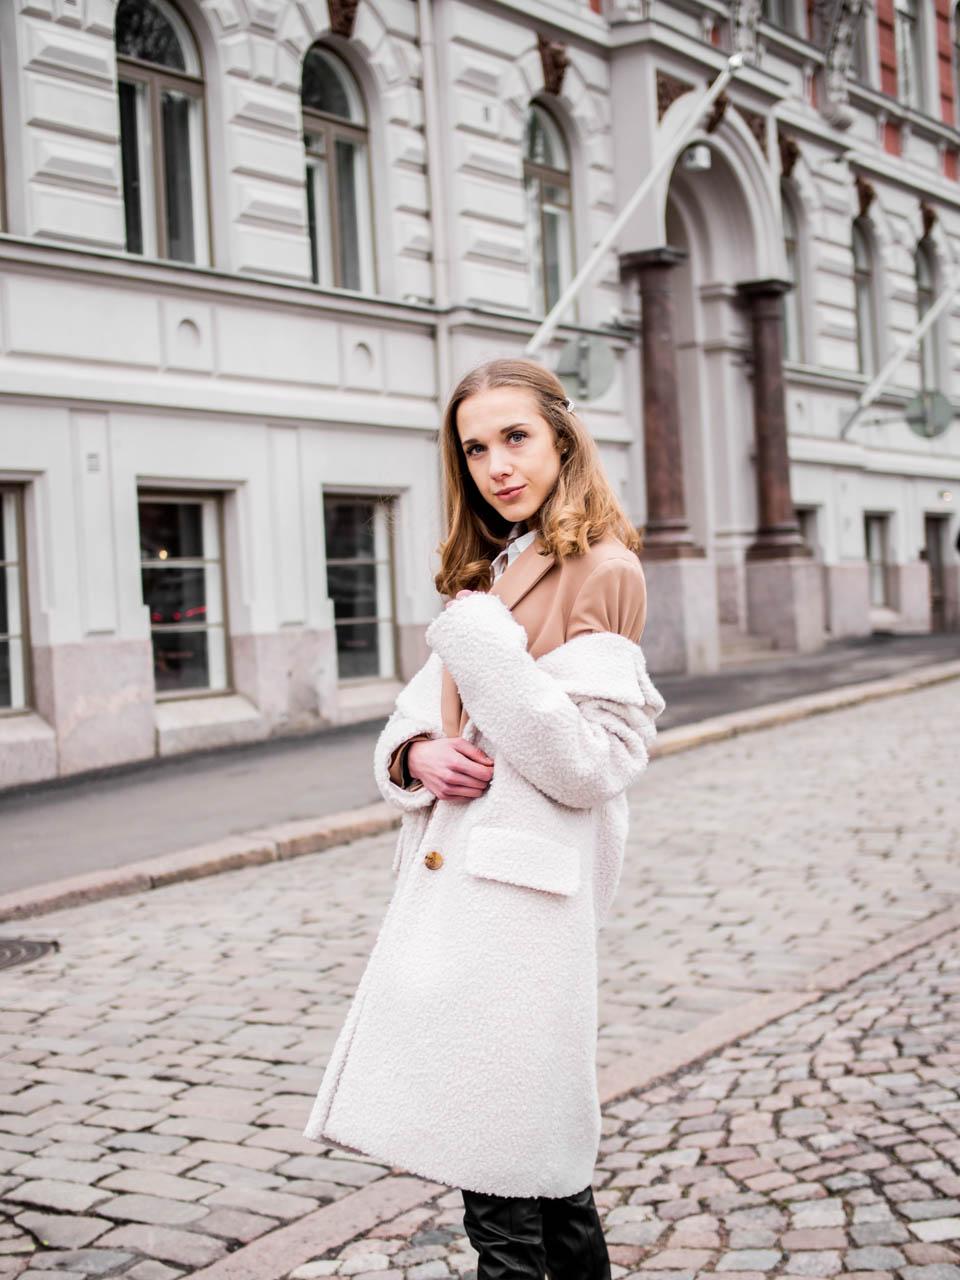 Fashion blogger outfit, white teddy coat, camel blazer, faux leather trousers - Muotibloggaaja, talvimuoti, Helsinki